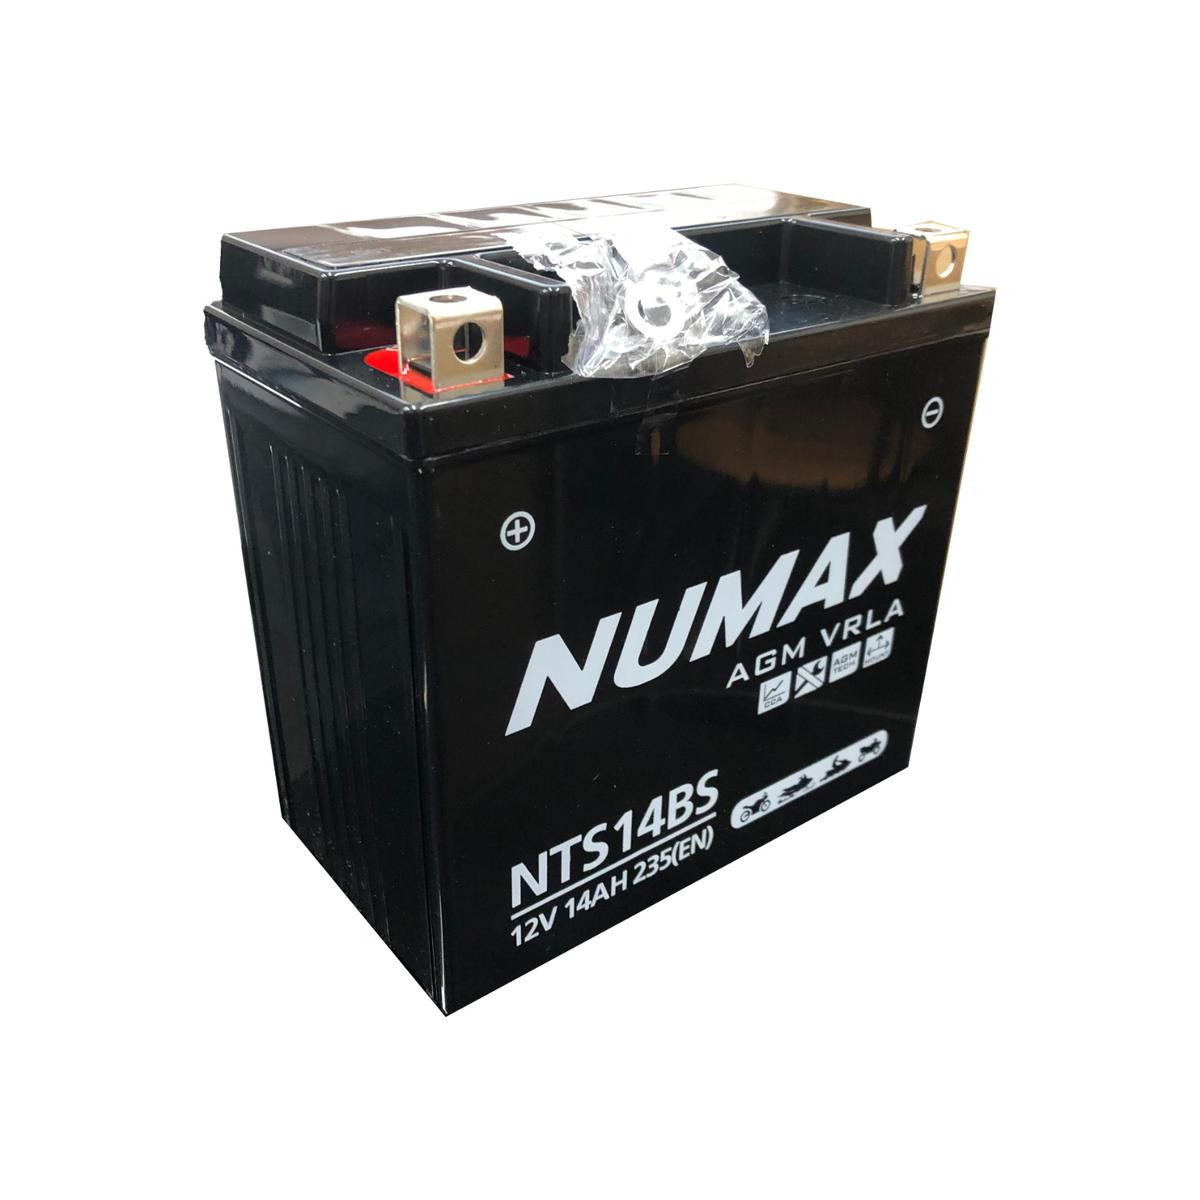 Numax NTS14BS 12v Motorbike Bike Battery SUZUKI 1400cc GSX1400 YTX14-4